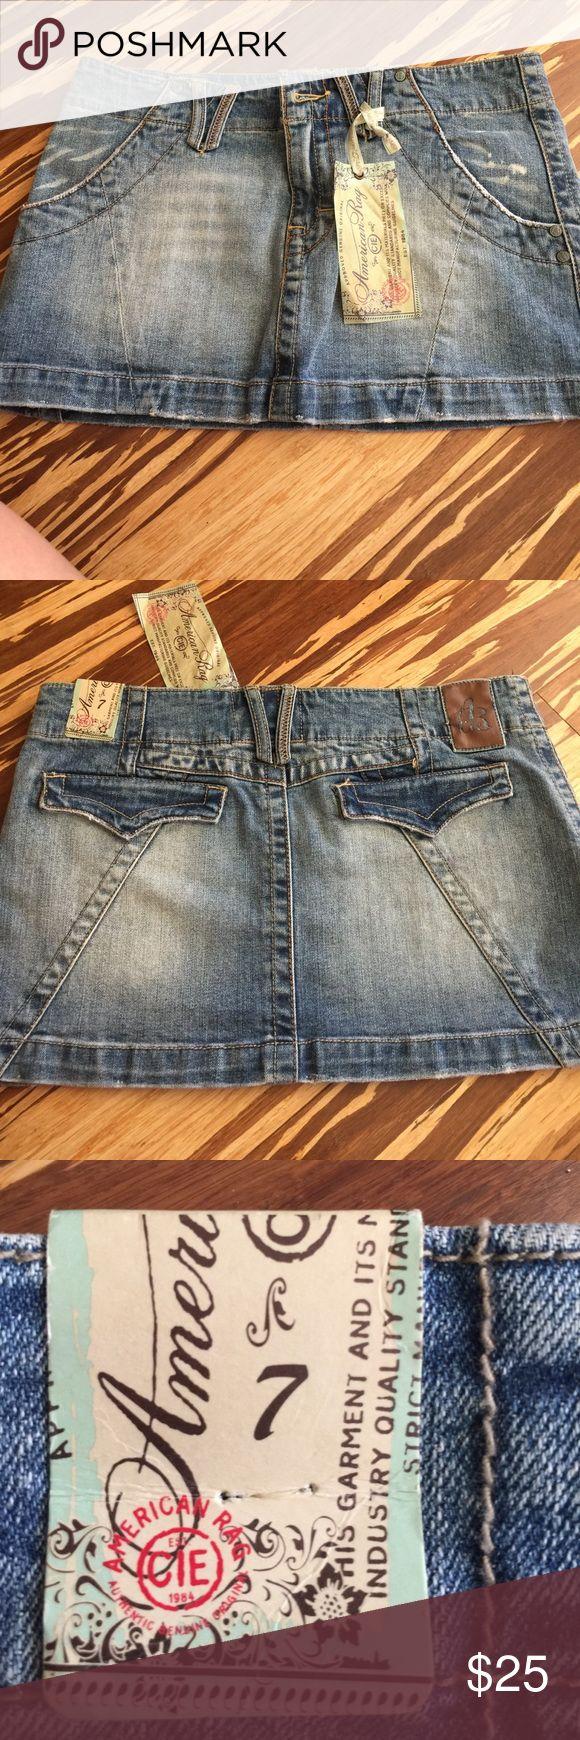 Brand new American Rag jean skirt Size 7 brand new American Rag Jean Skirt paid 39 at Macy's for it never got to wear it American Rag Skirts Mini